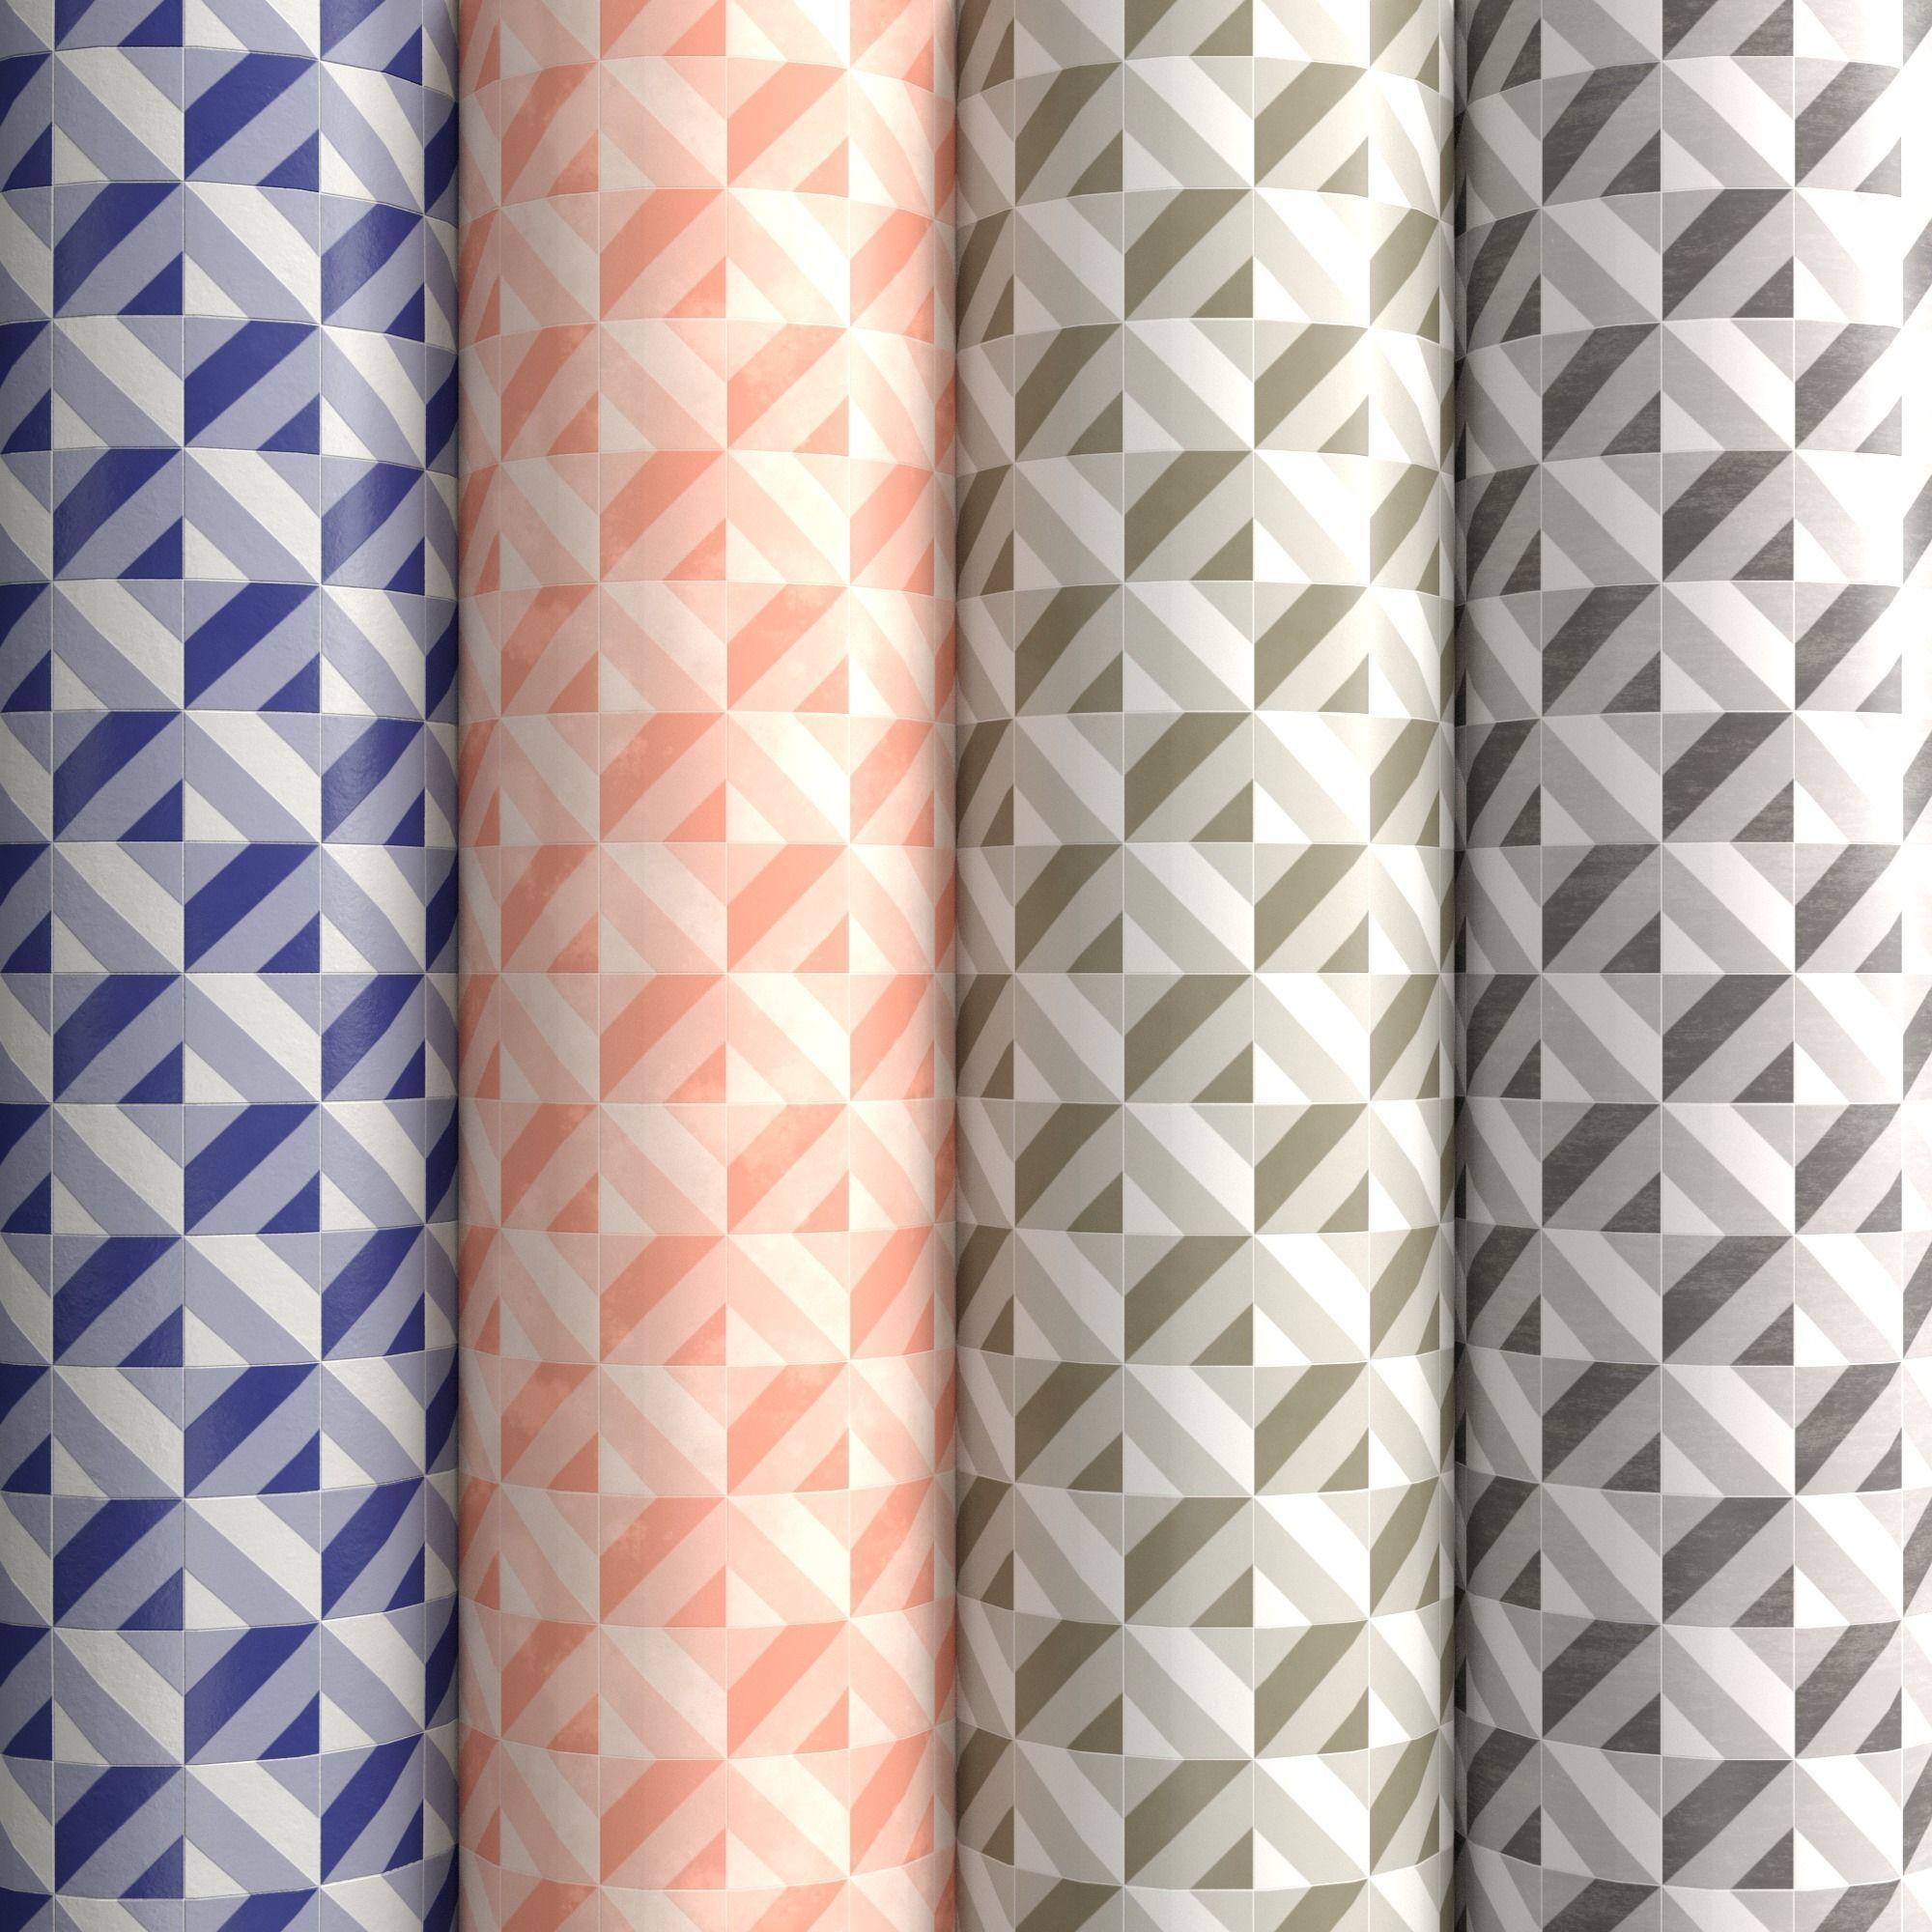 Materials 3- Tiles PBR